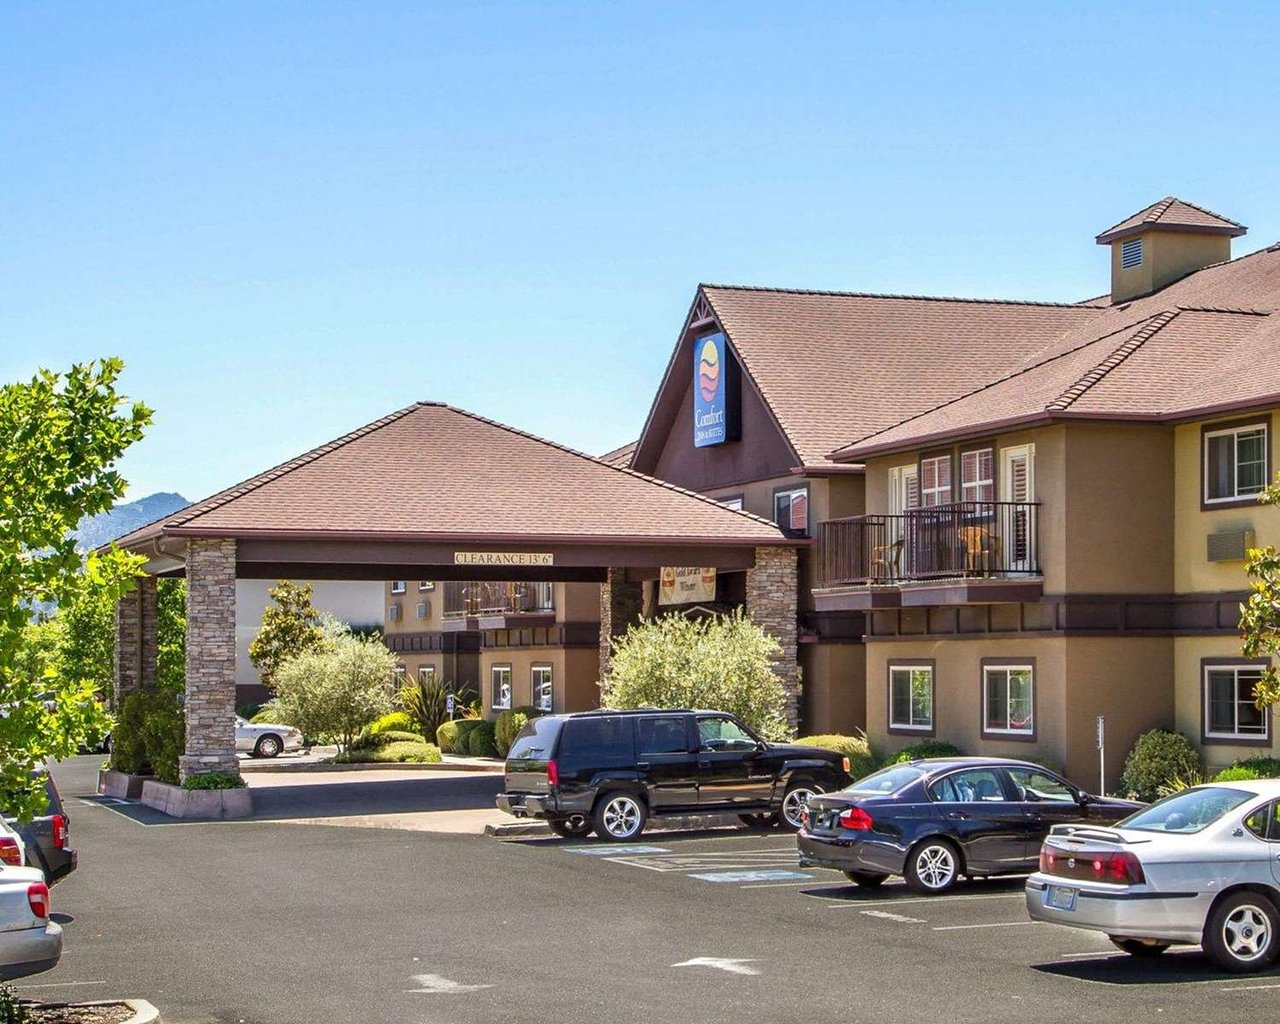 the 10 best hotels in ukiah ca for 2019 from 61 tripadvisor rh tripadvisor com